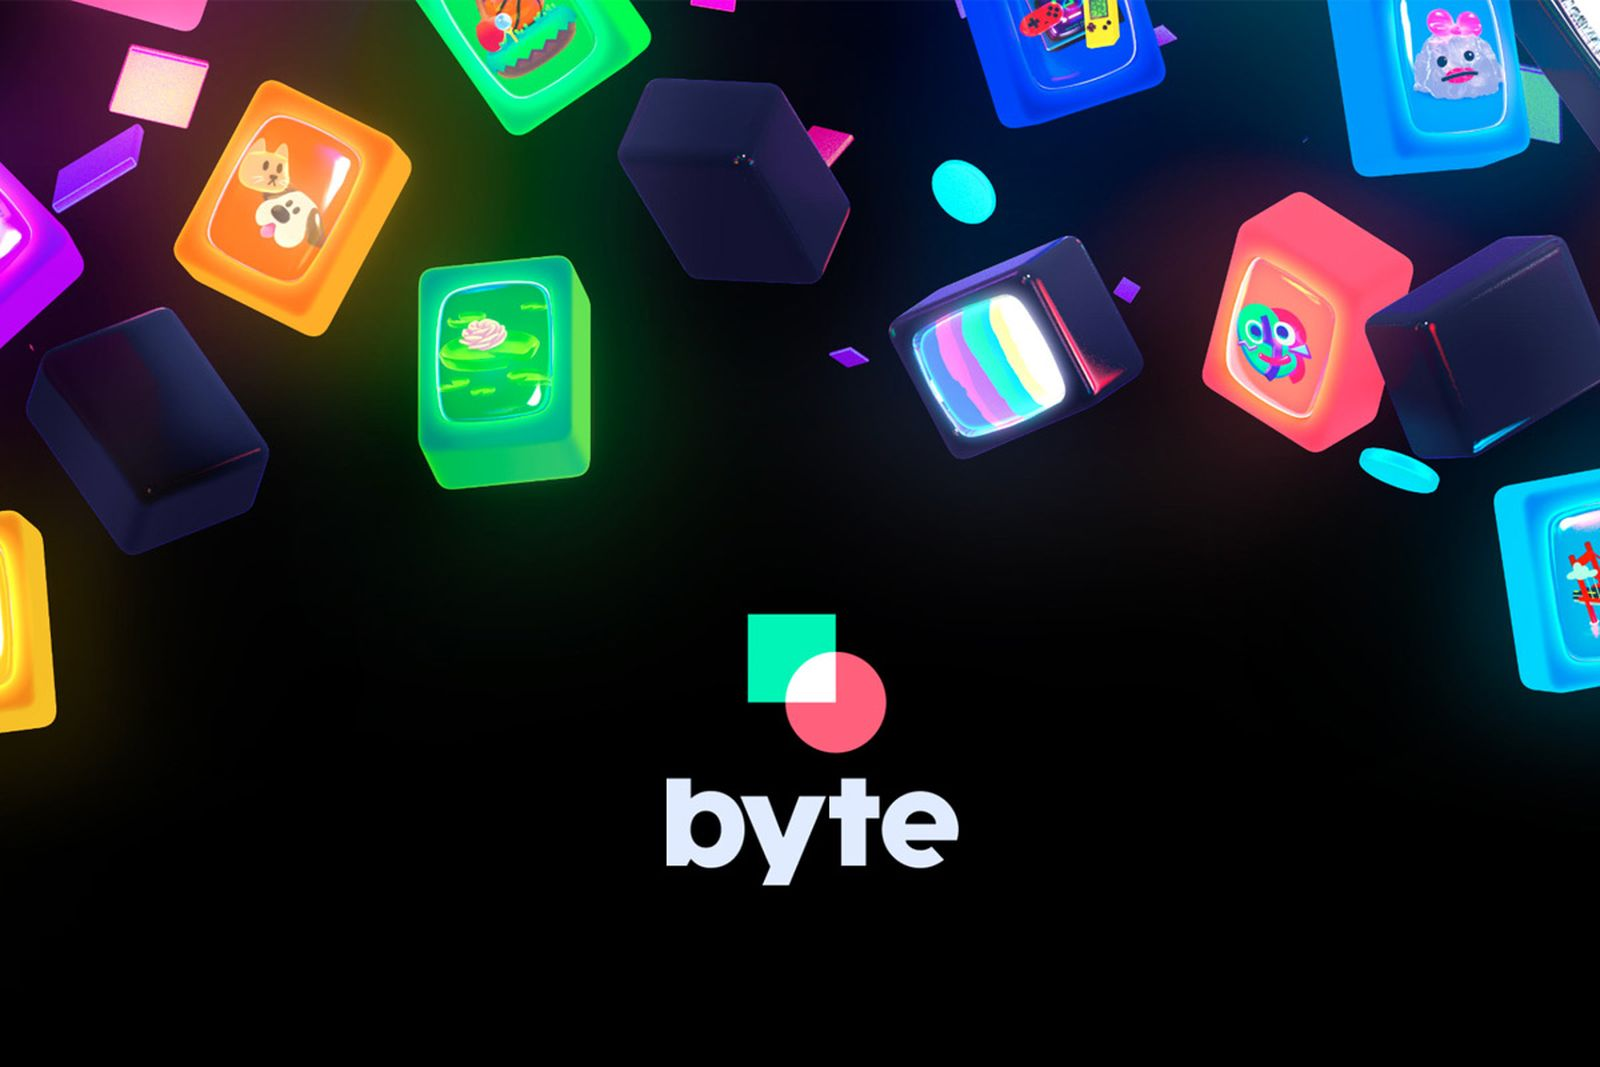 vine-back-form-new-app-called-byte-01